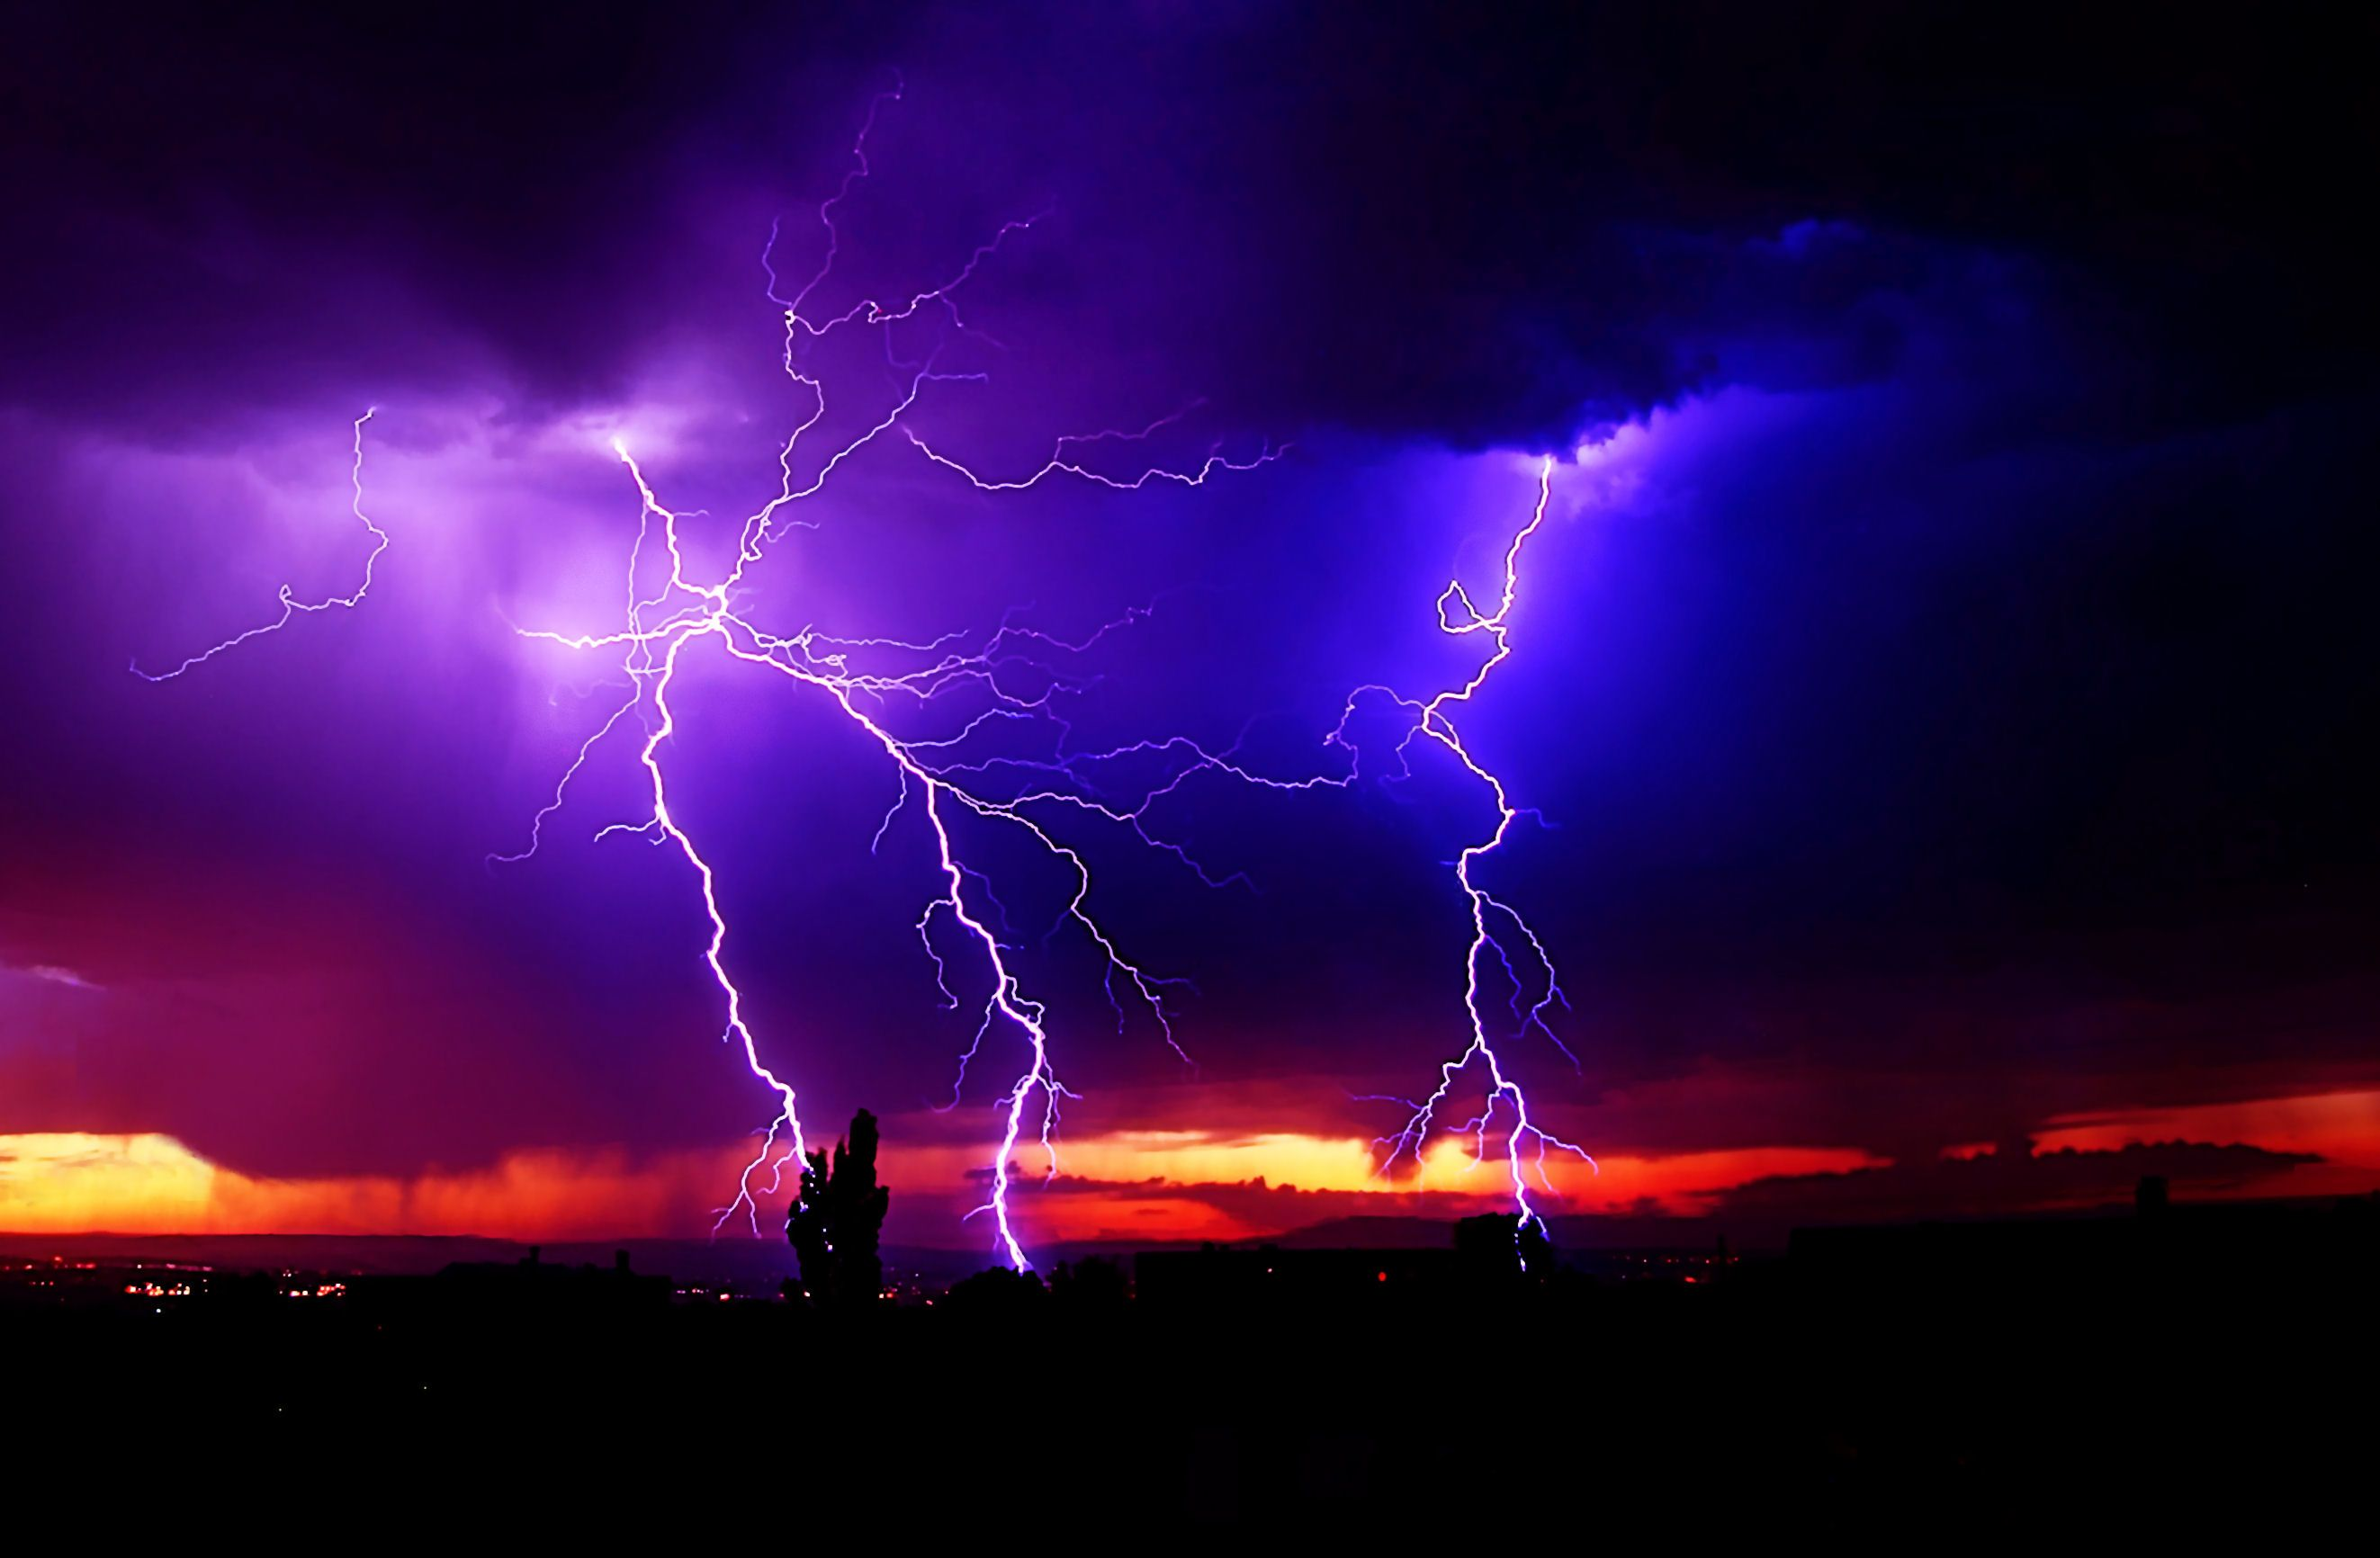 Spectacular lightning | Striking Skies | Pinterest